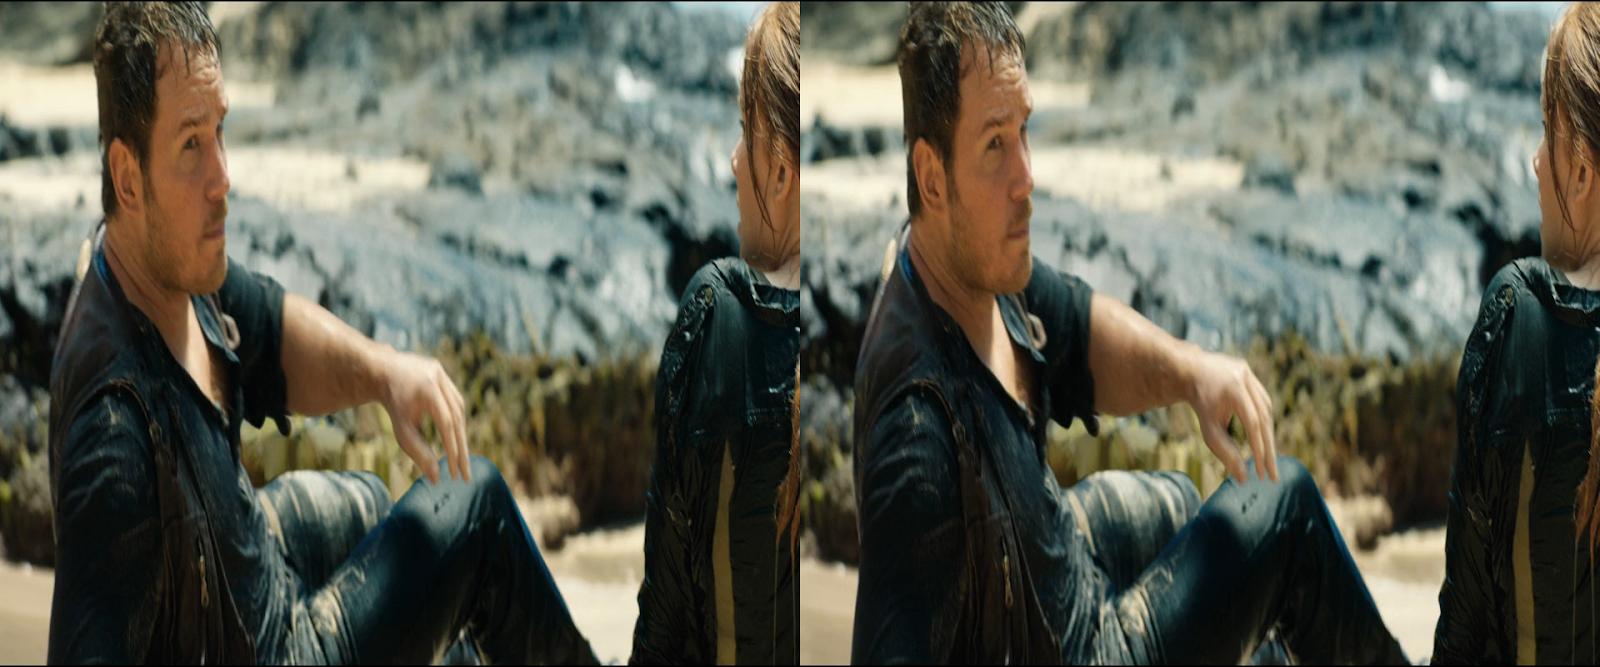 Jurassic World: El Reino Caído (2018) 3D SBS 1080p Latino-Ingles captura 4